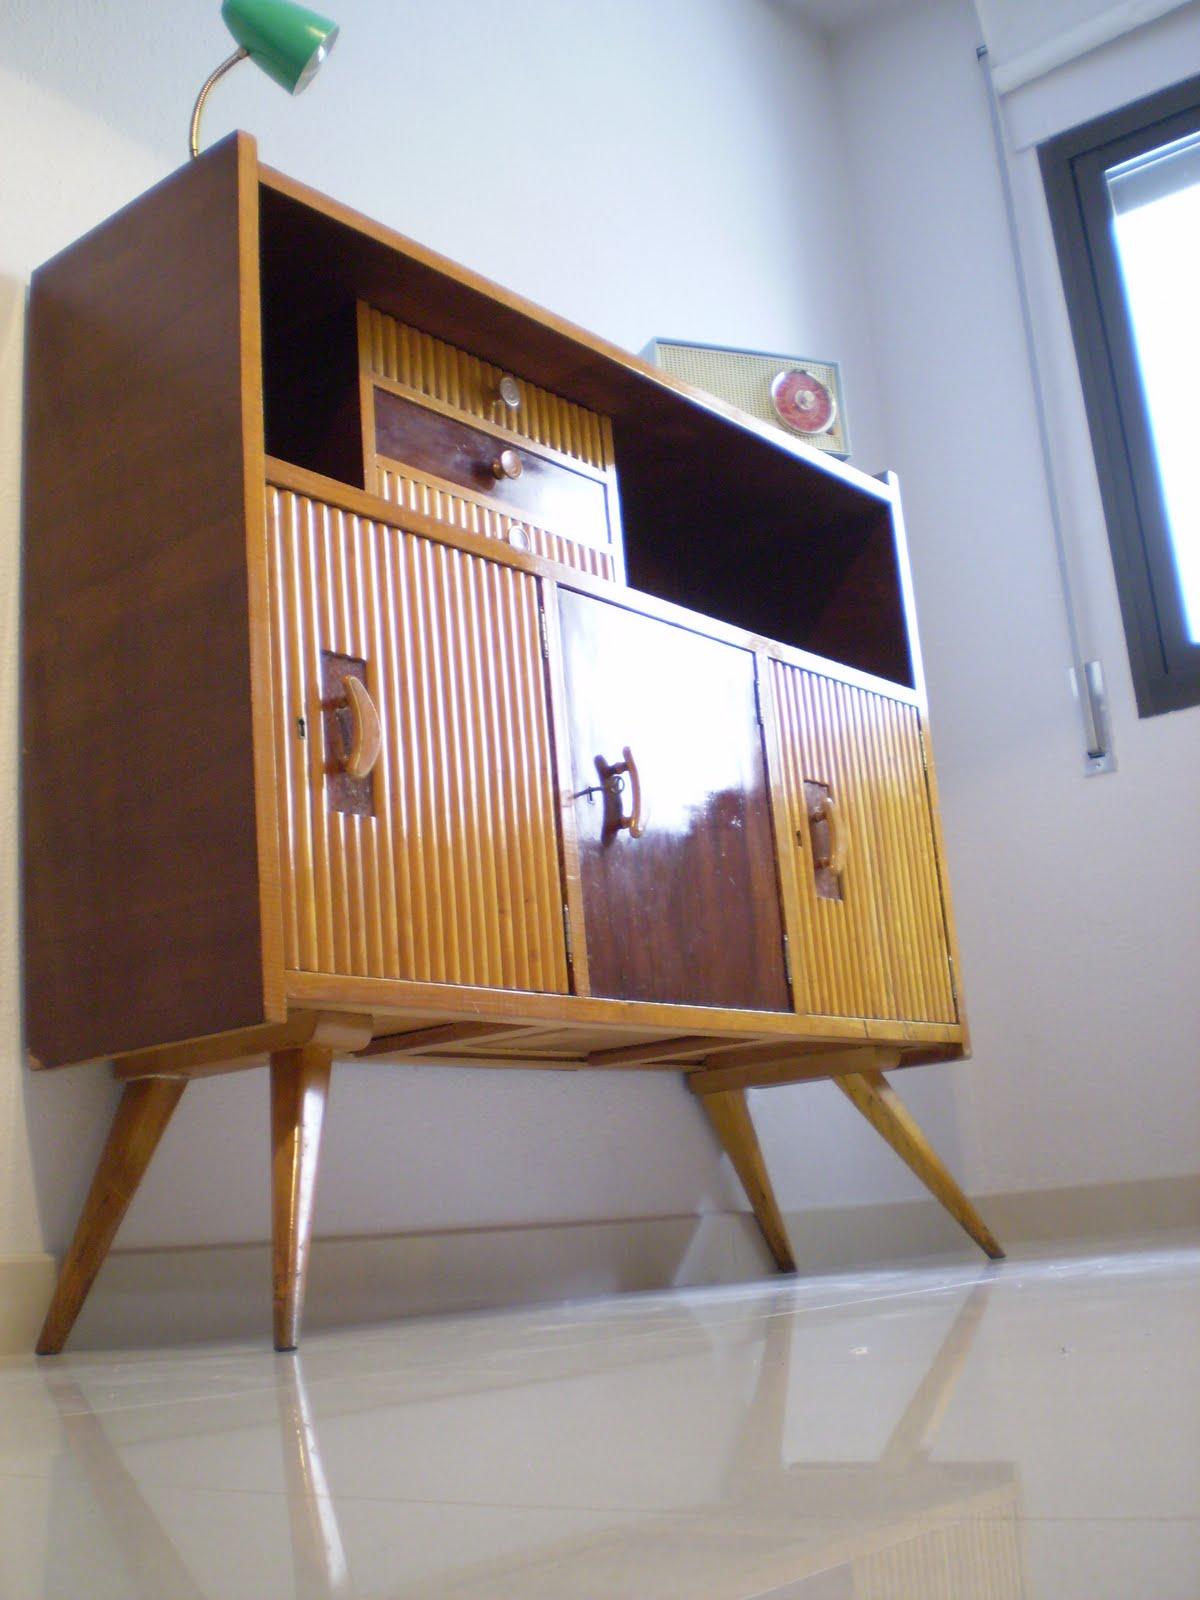 Vintager a mueble aparador a os 50 - Muebles anos 50 madrid ...